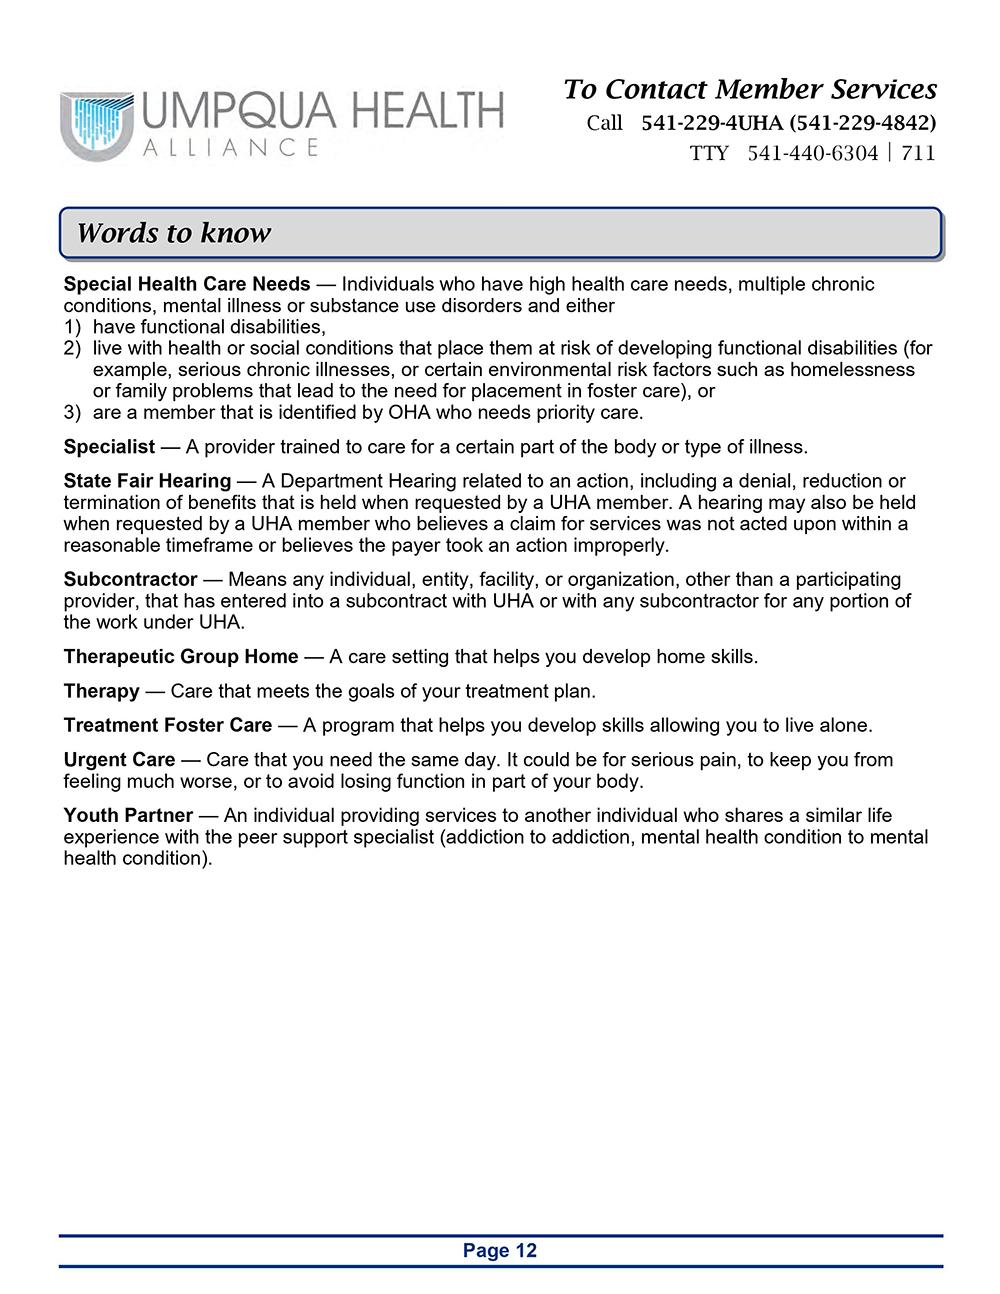 Member Handbook - Page 12